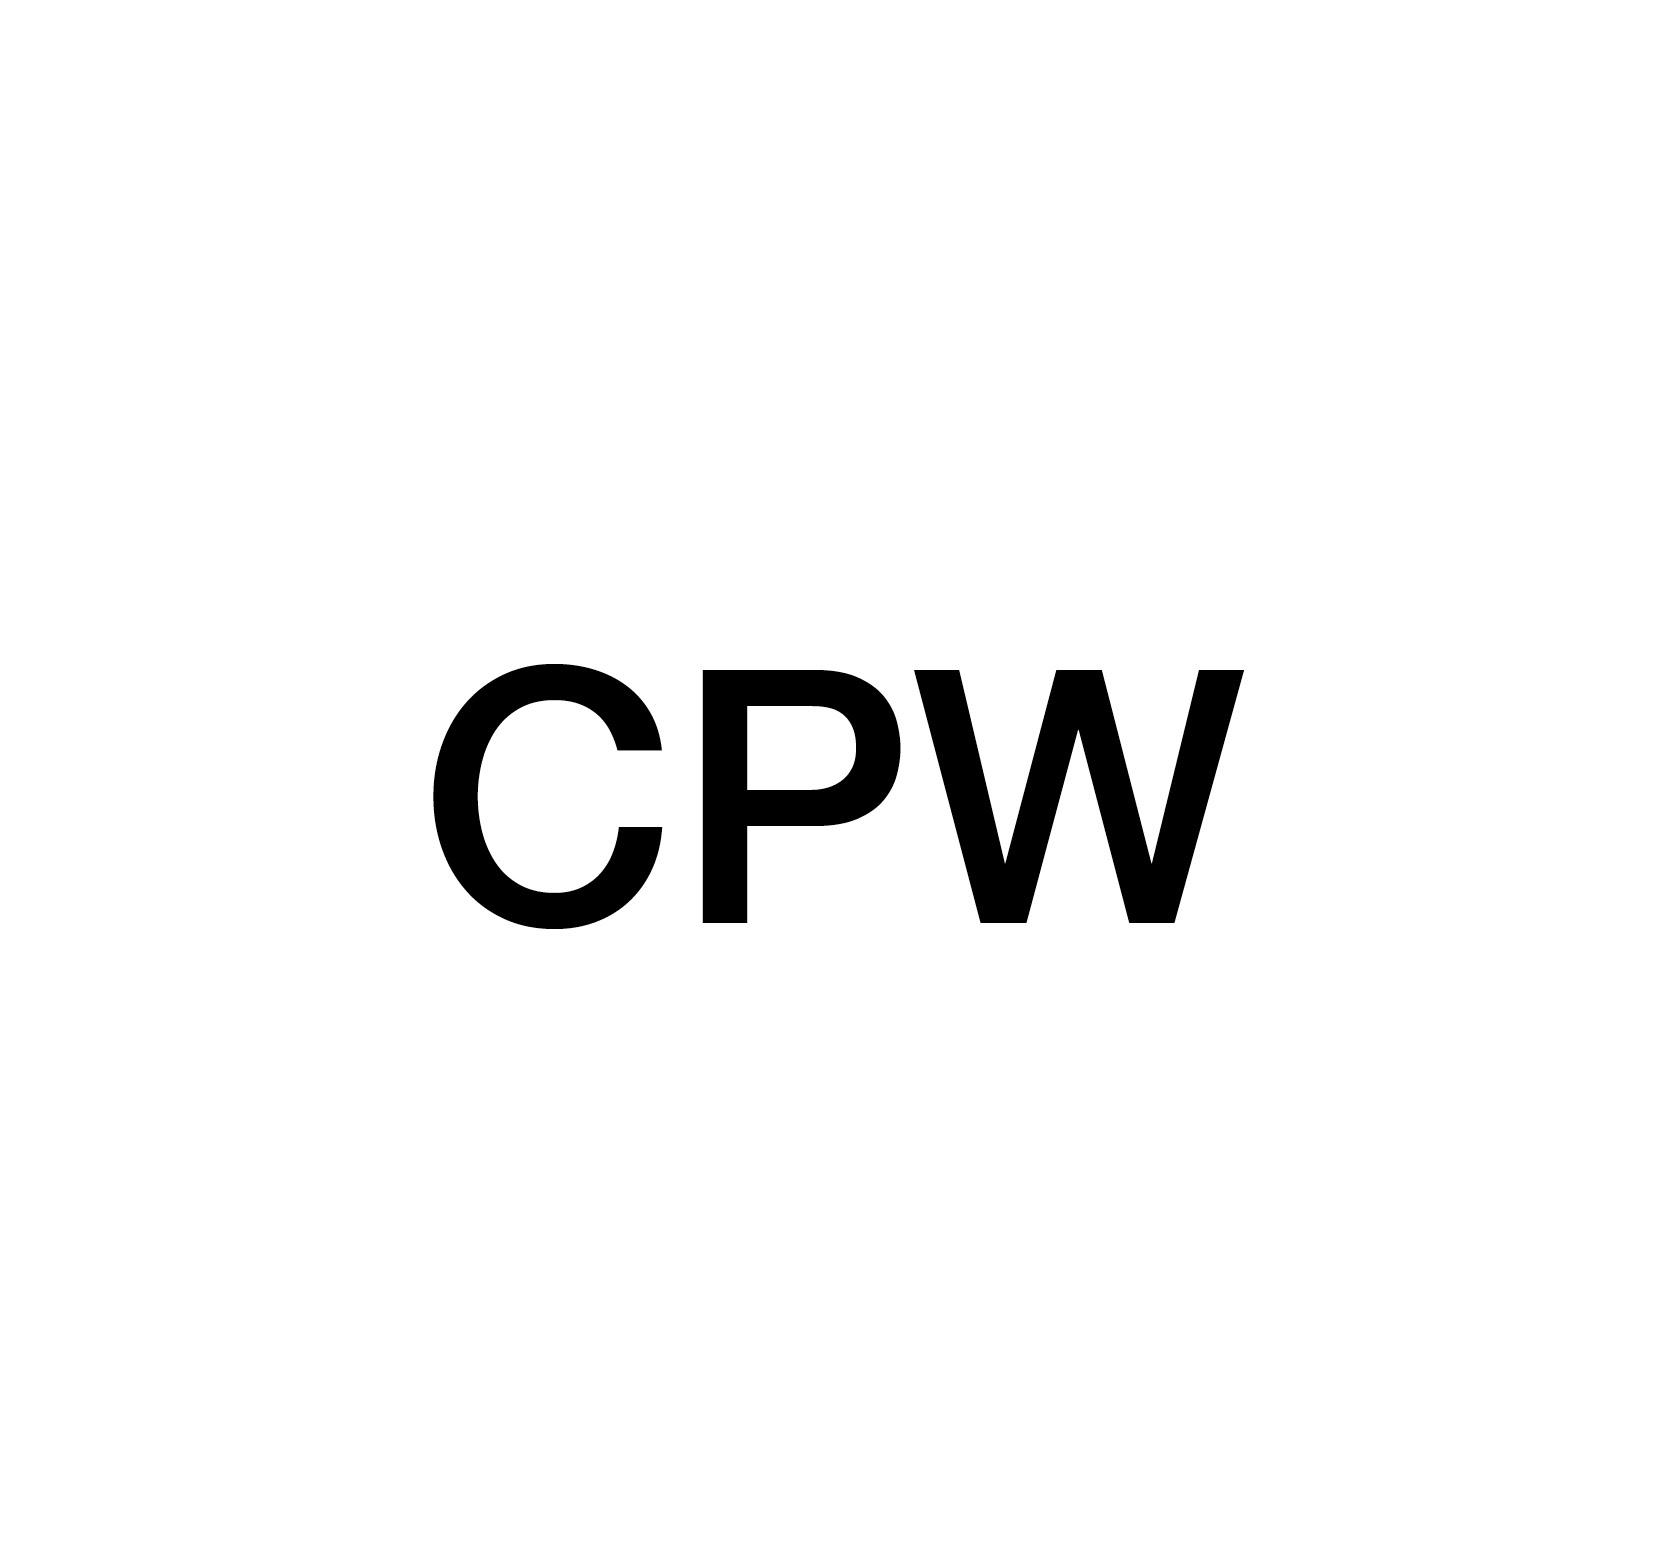 CPW.jpg